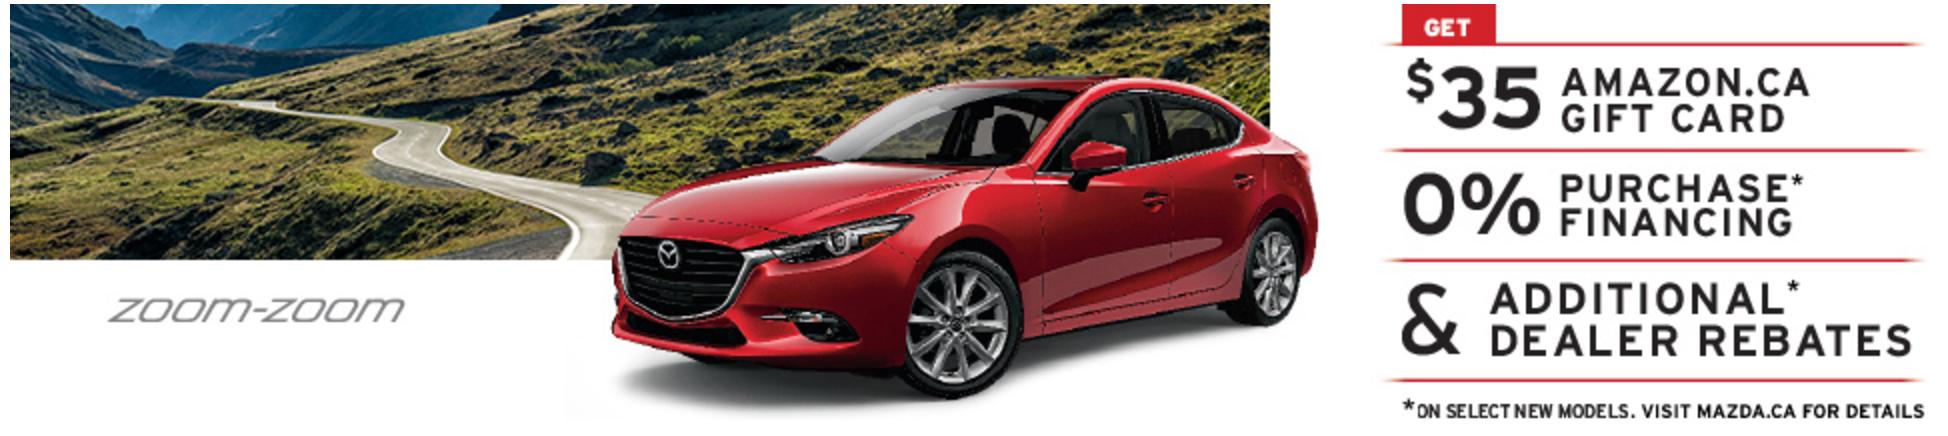 Mazda coupons canada